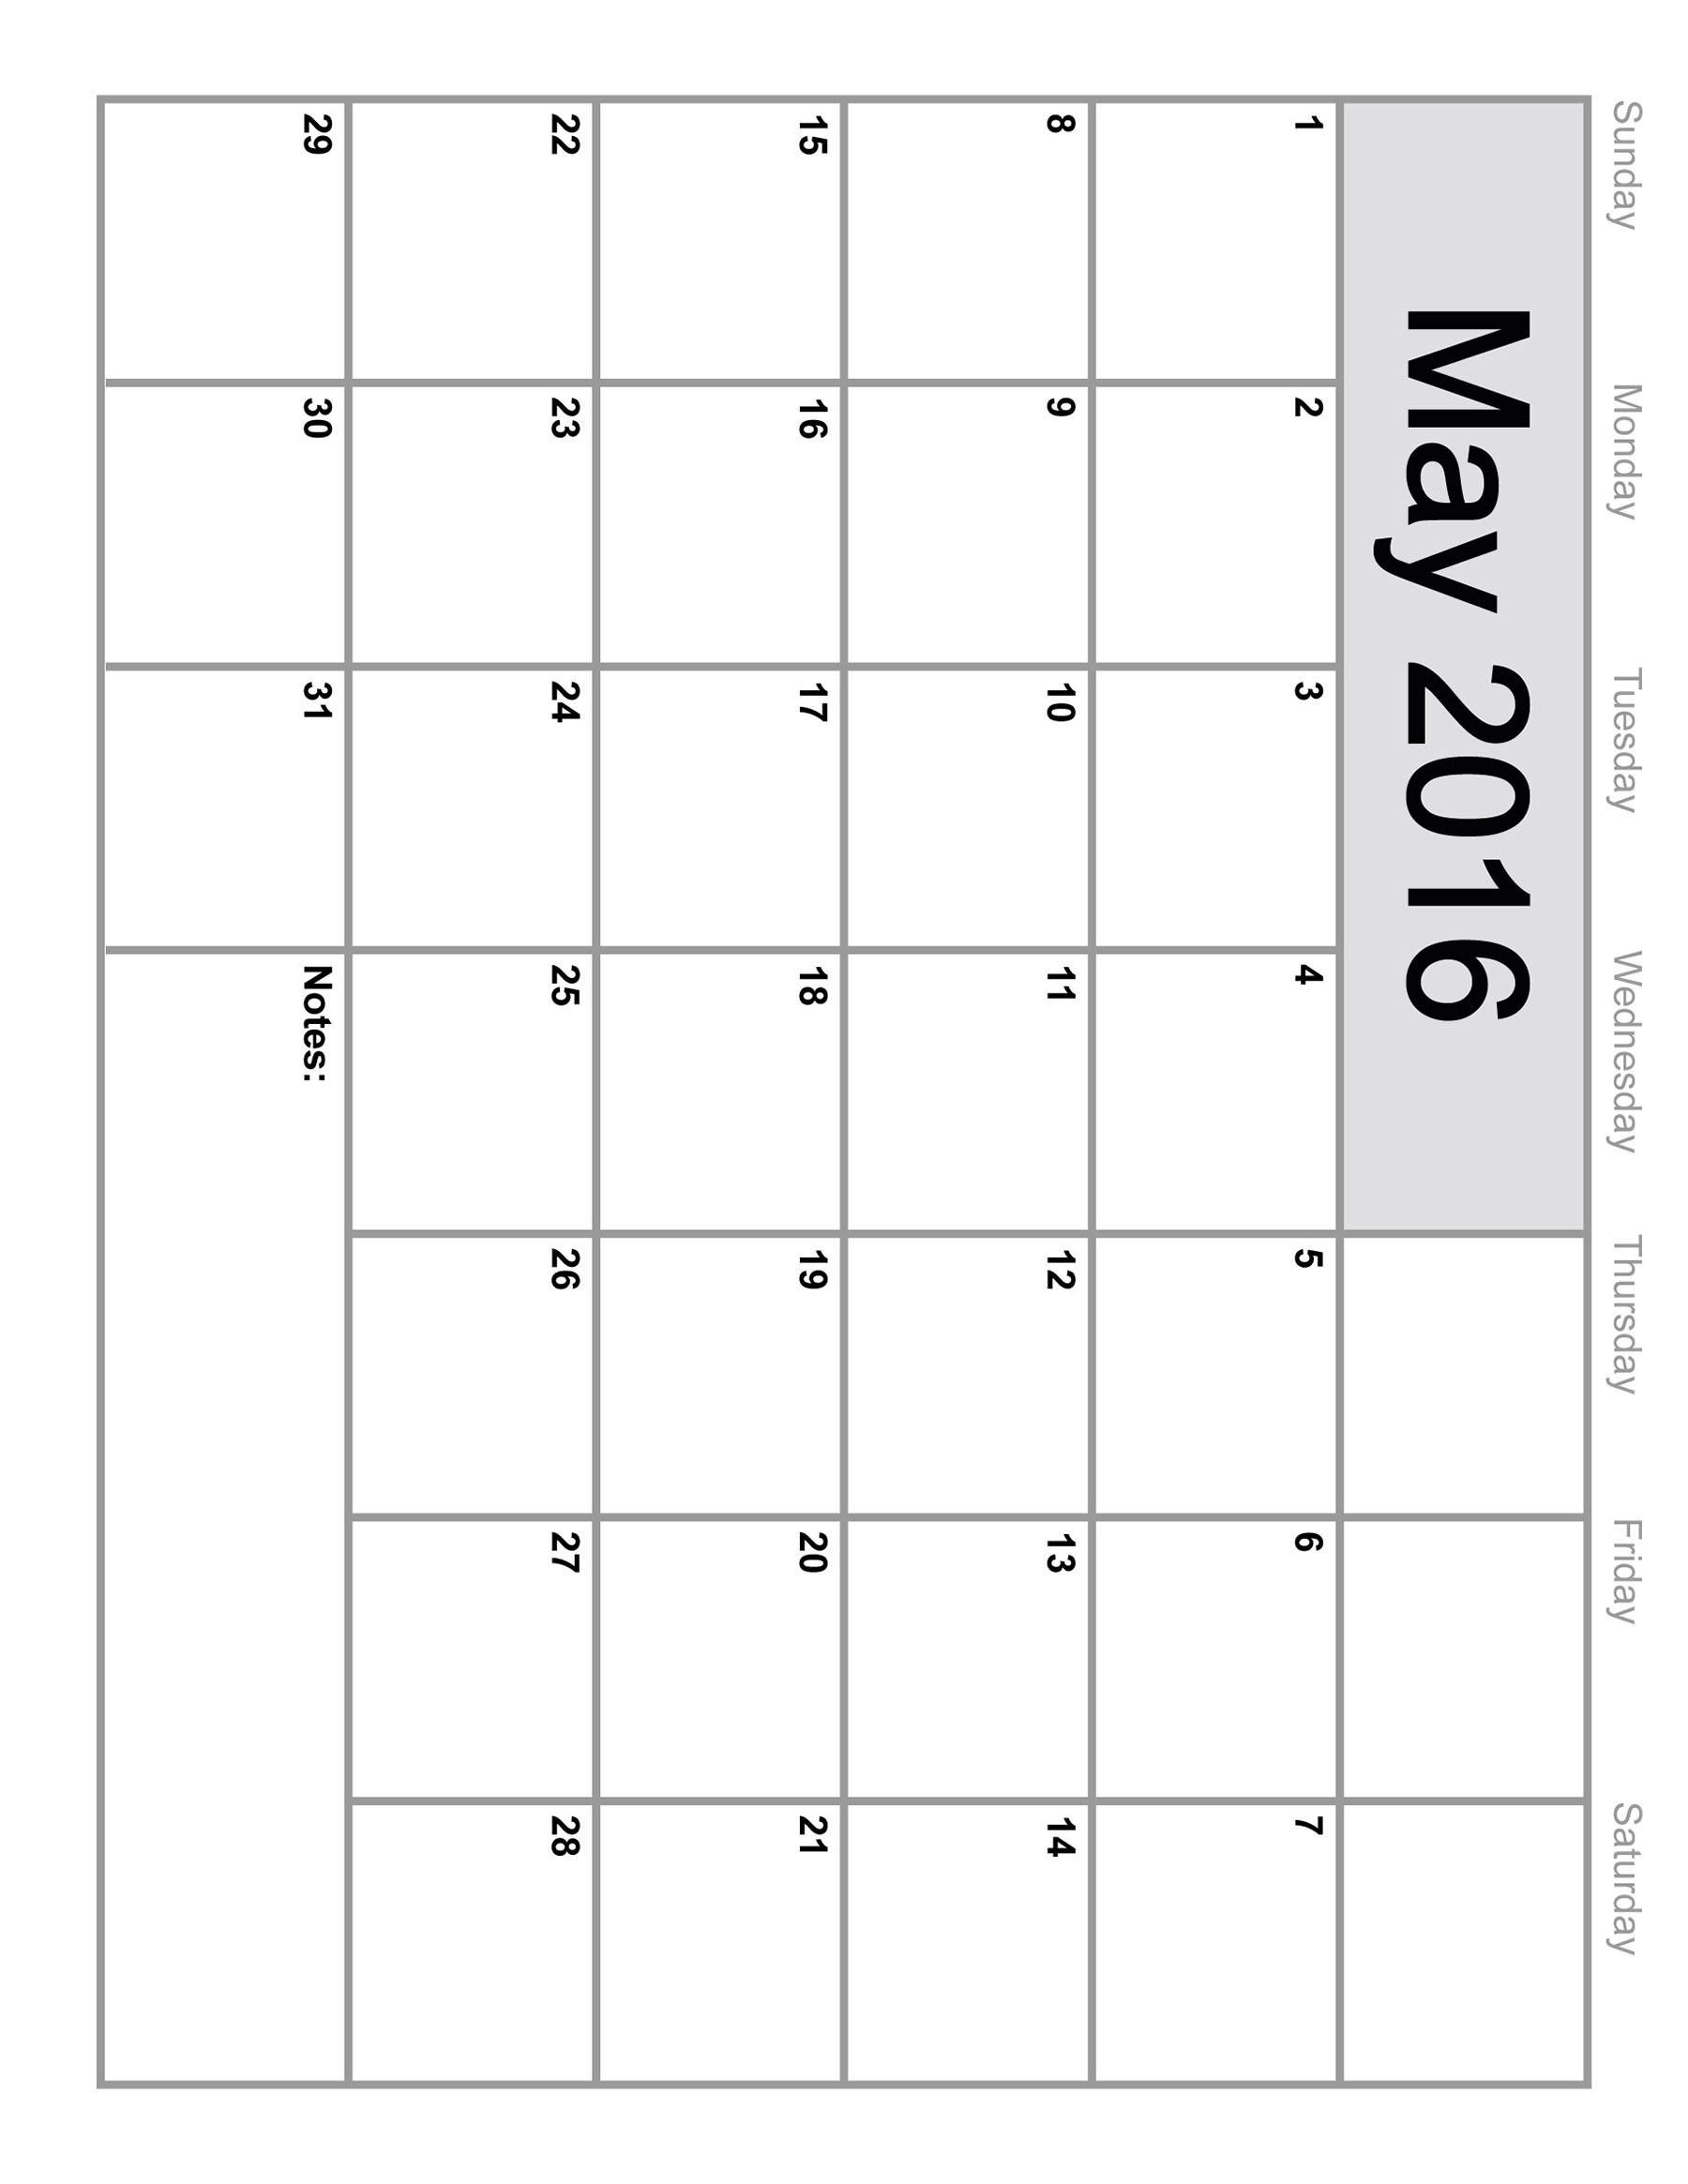 Incredible 8 X 10 Blank Calendar • Printable Blank Calendar Template pertaining to 8 X 10 Print Calendar